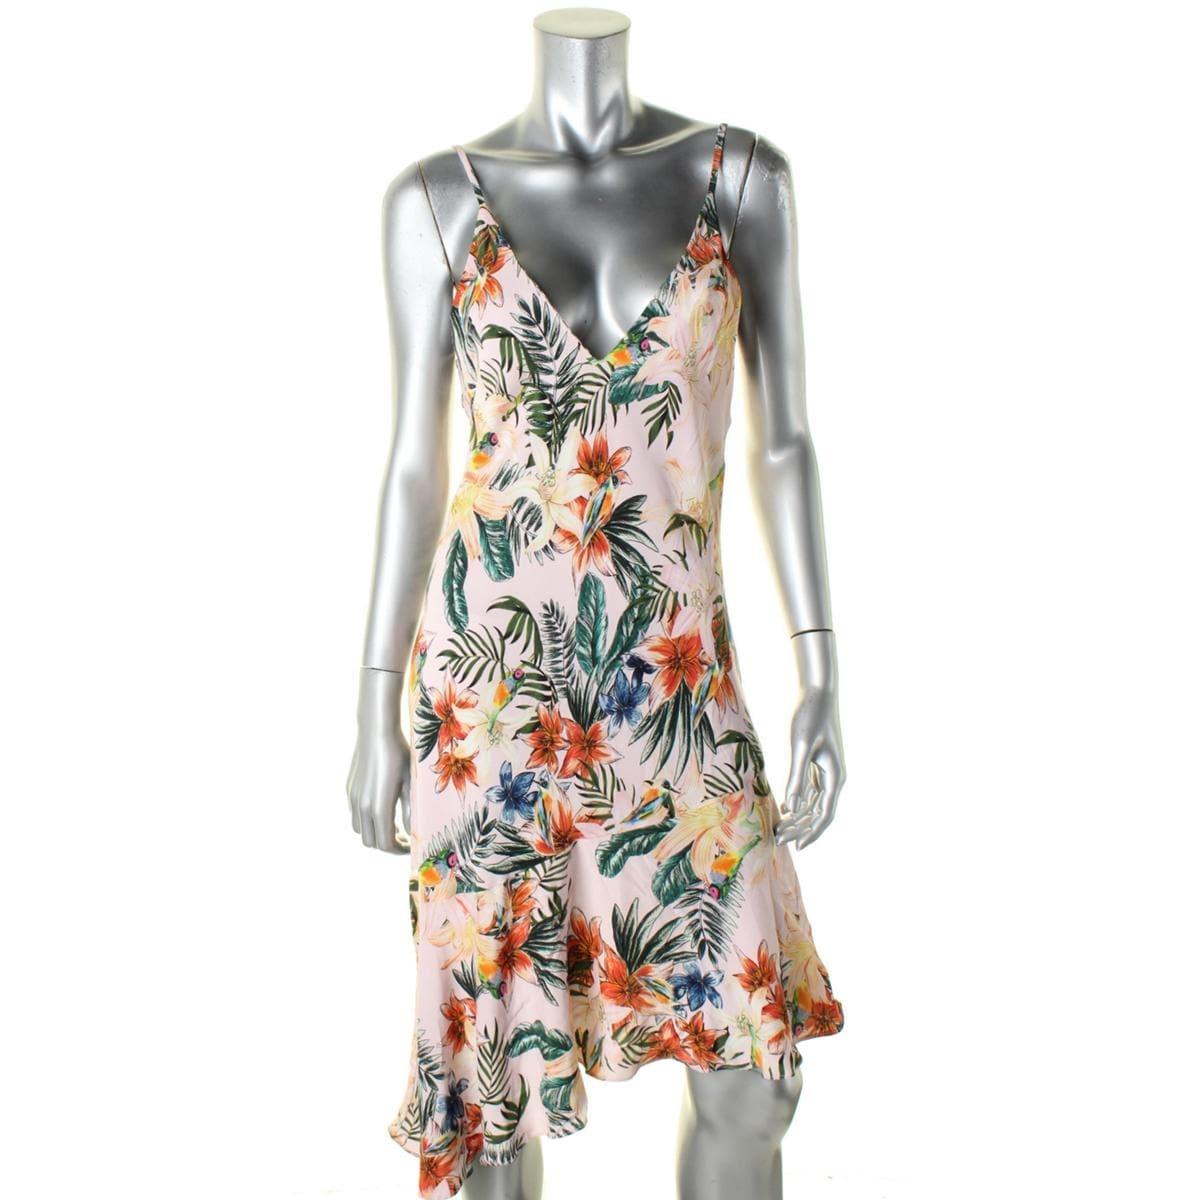 87b17071 Shop Amanda Uprichard Womens Blouse Silk Sleeveless - Free Shipping On Orders  Over $45 - Overstock - 16952155